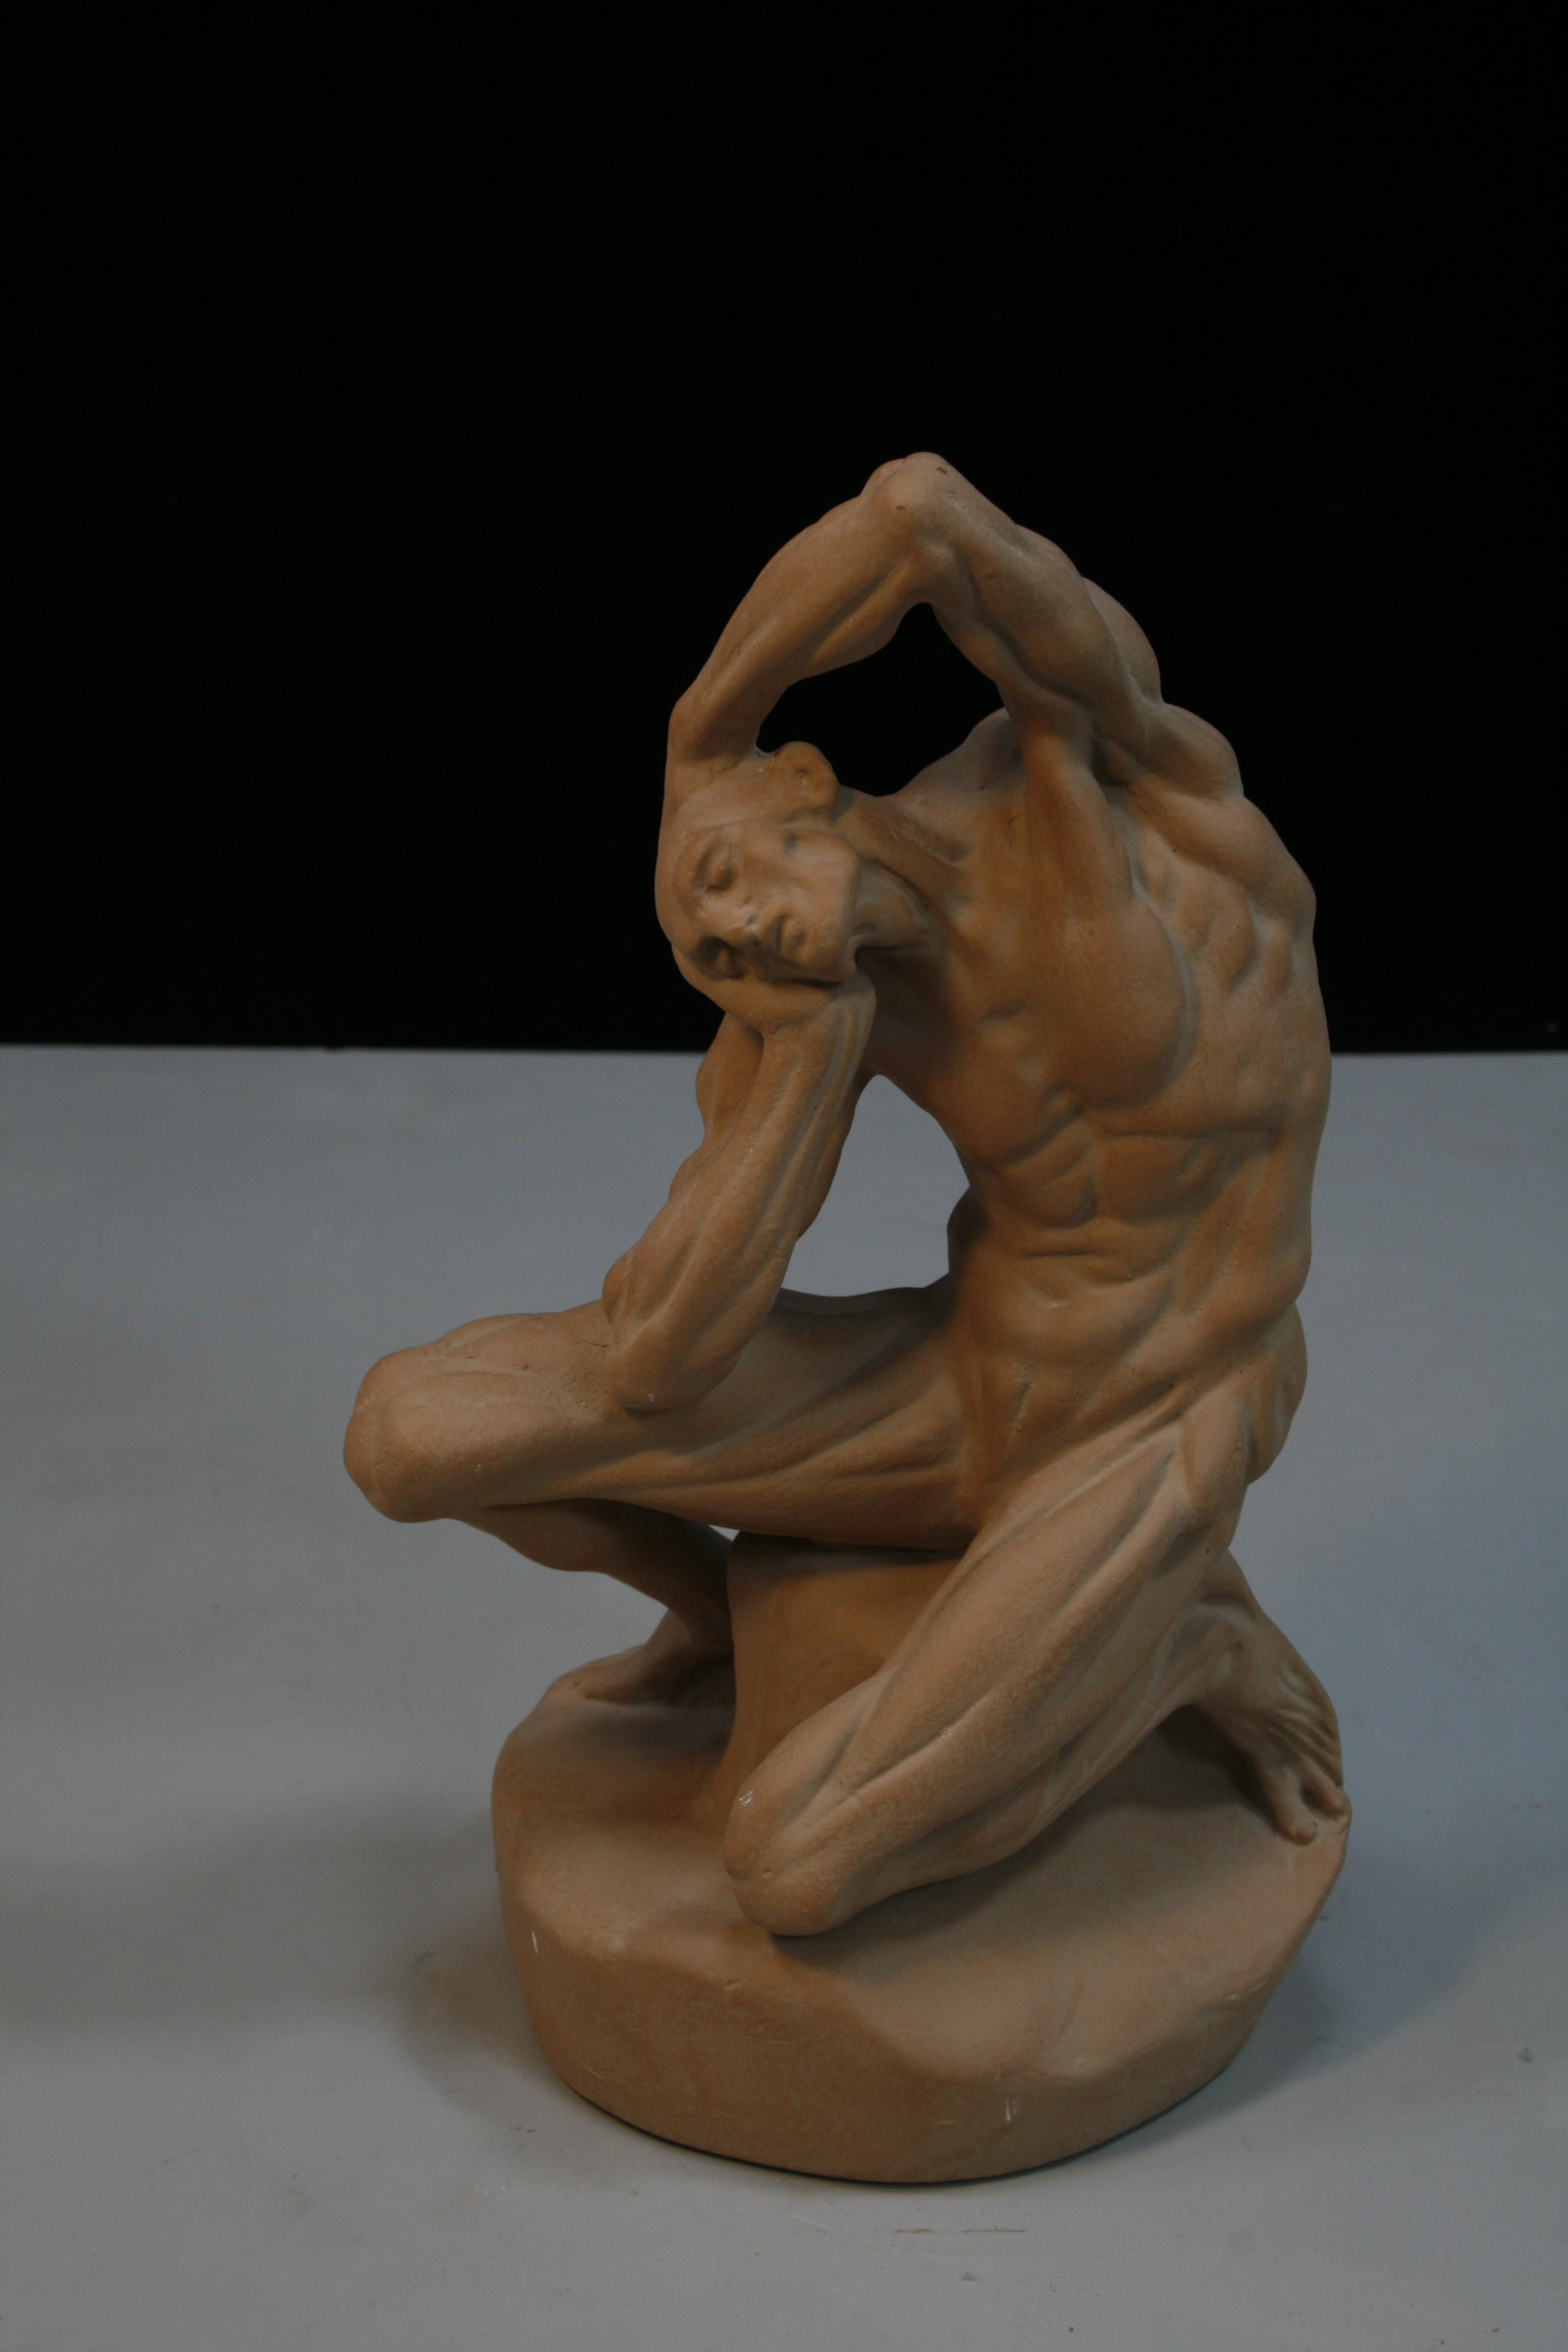 Anatomy of Man 2 - Item #605